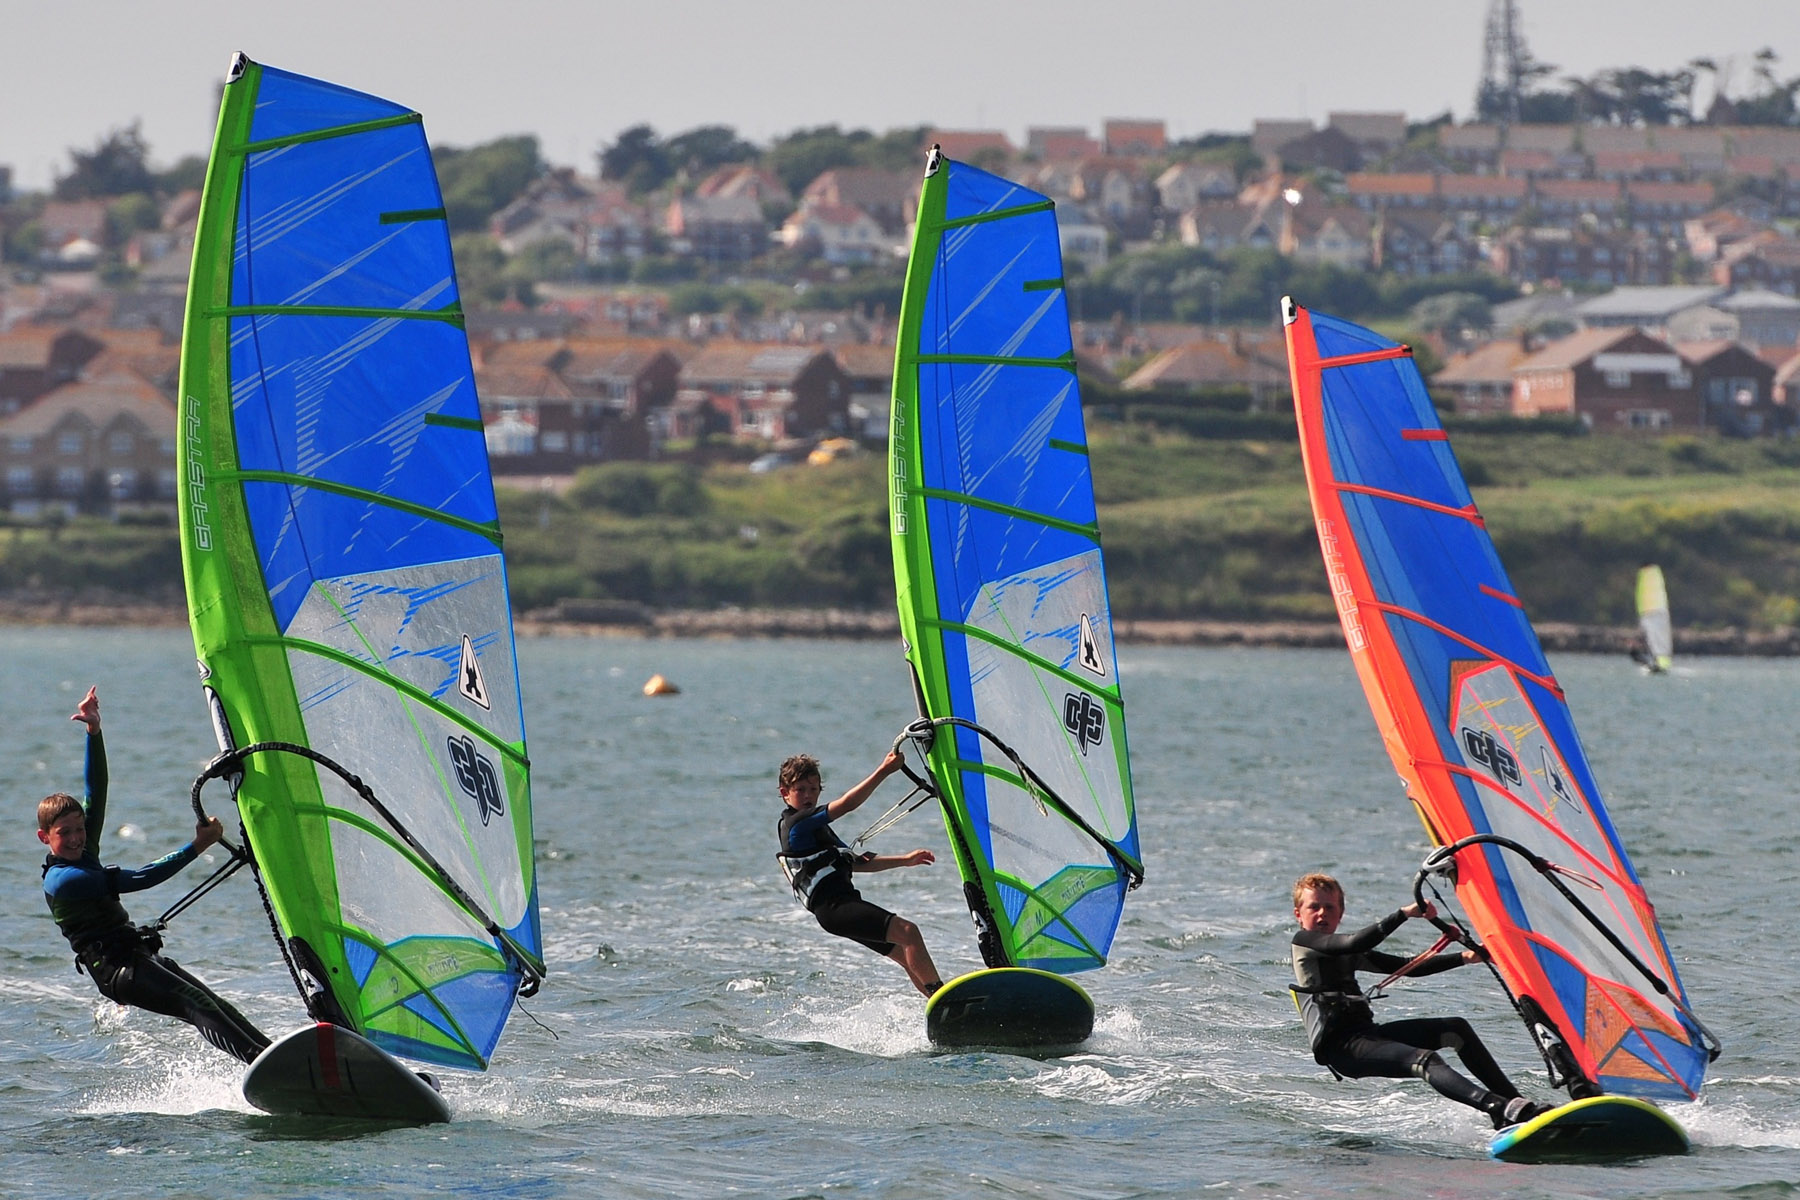 2 day Portland Harbour RYA intermediate windsurf course in Dorset